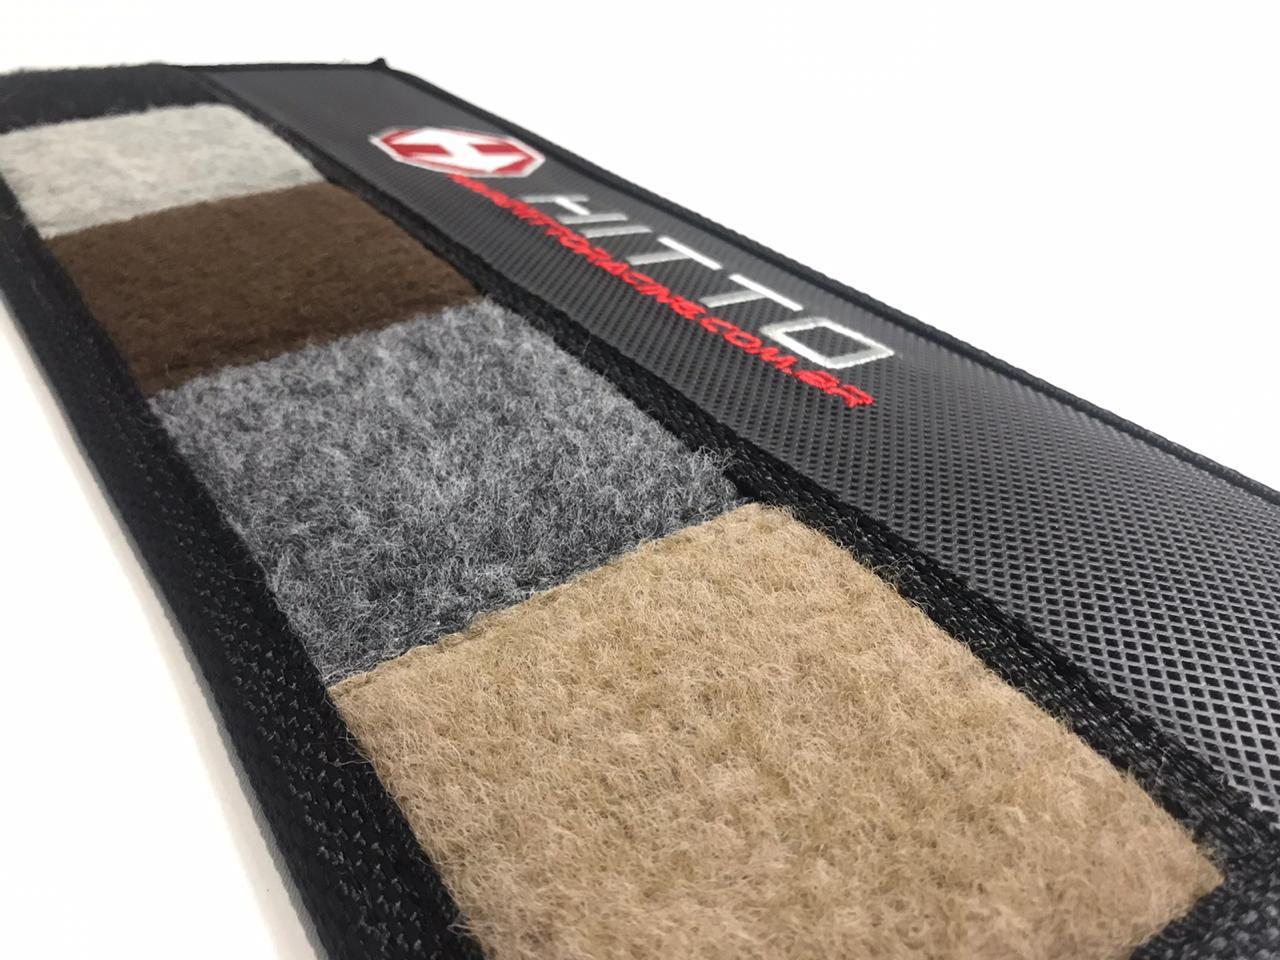 Tapetes Carpete Fiat Elba Carpete Luxo  base pinada